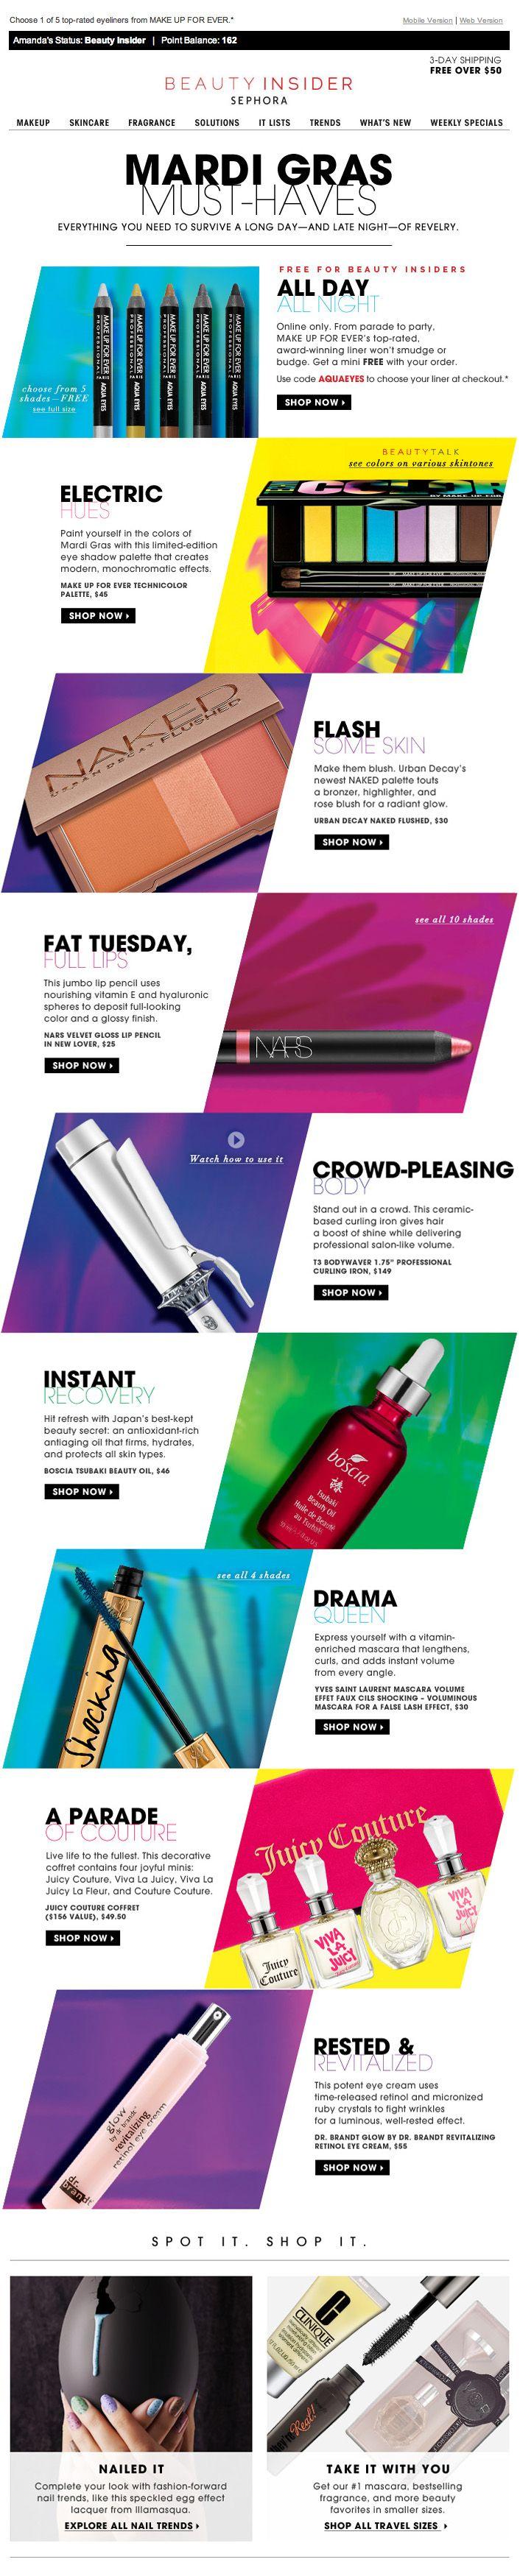 Sephora Beauty Insider Email